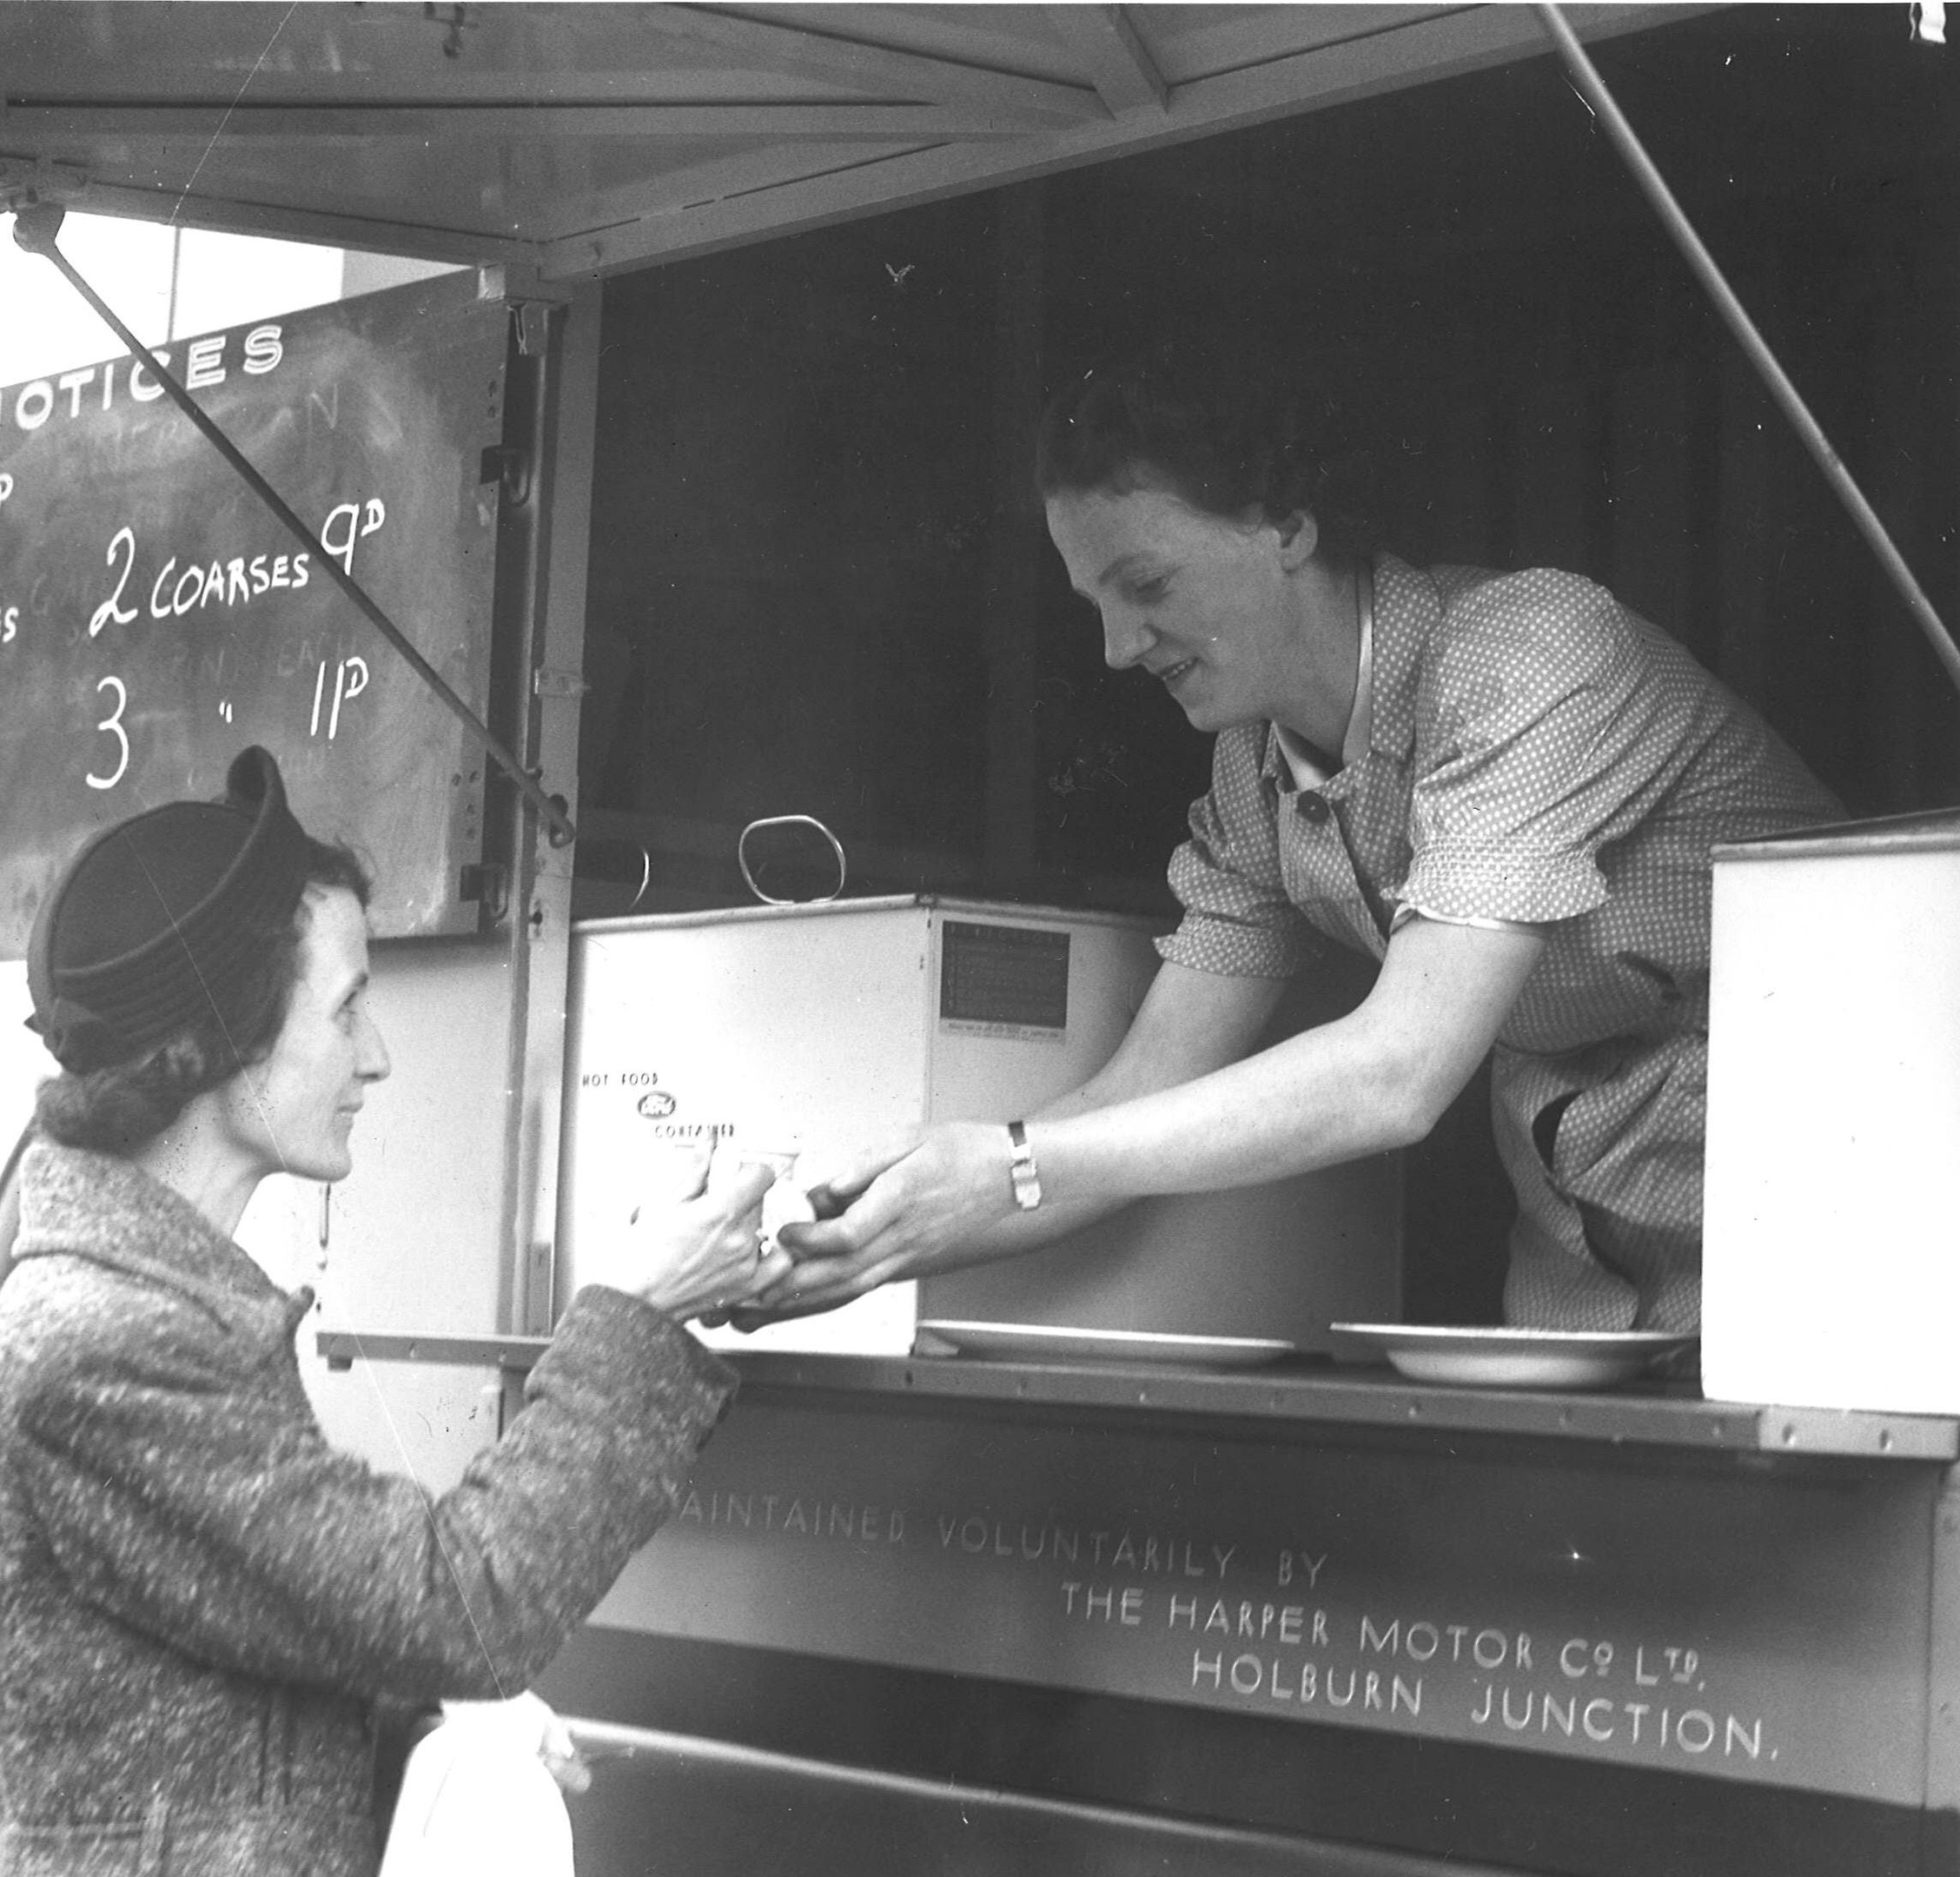 A restaurant van in Ruhrieson, March 1942